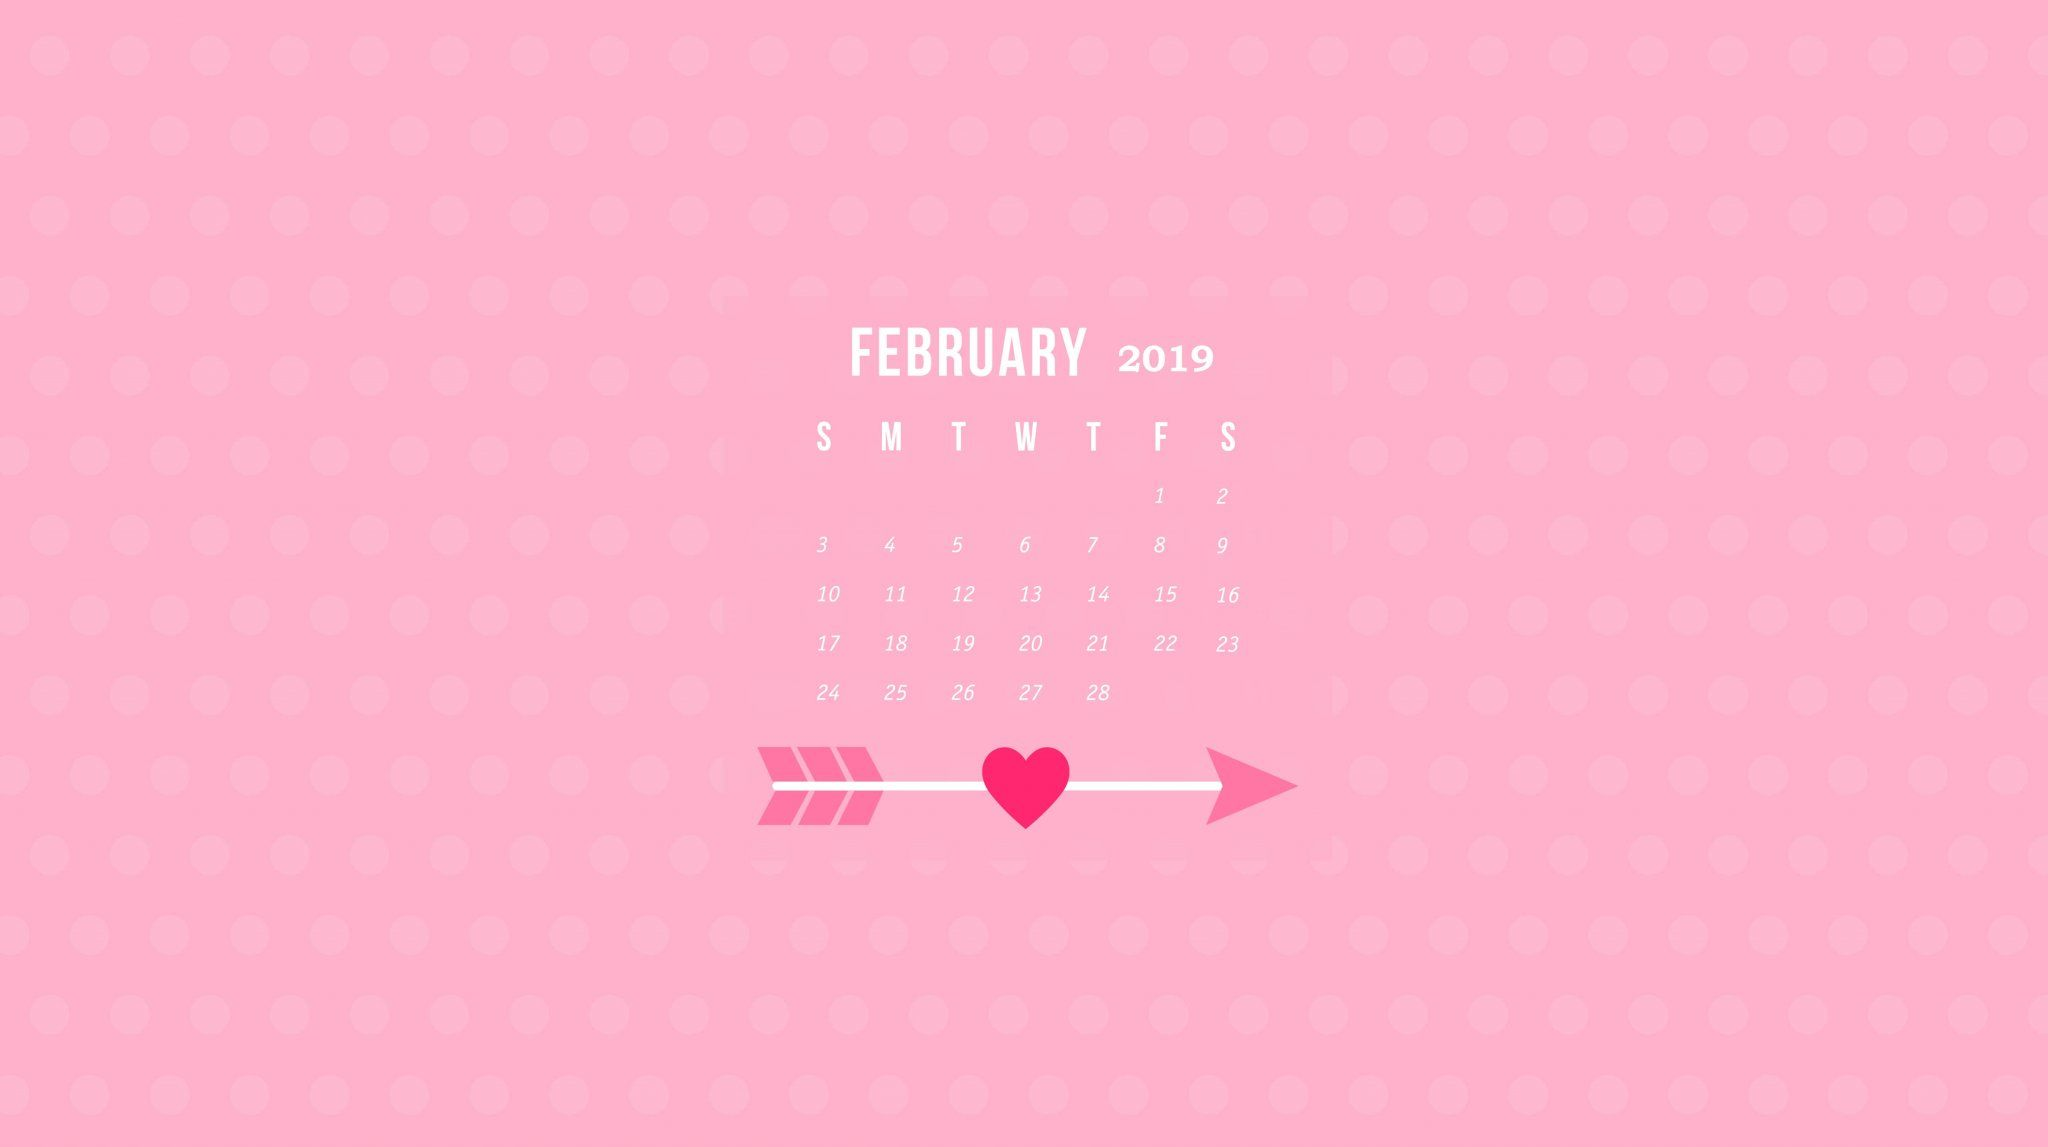 February 2019 Calendar Wallpaper Phone February 2019 Calendar Wallpapers #February2019